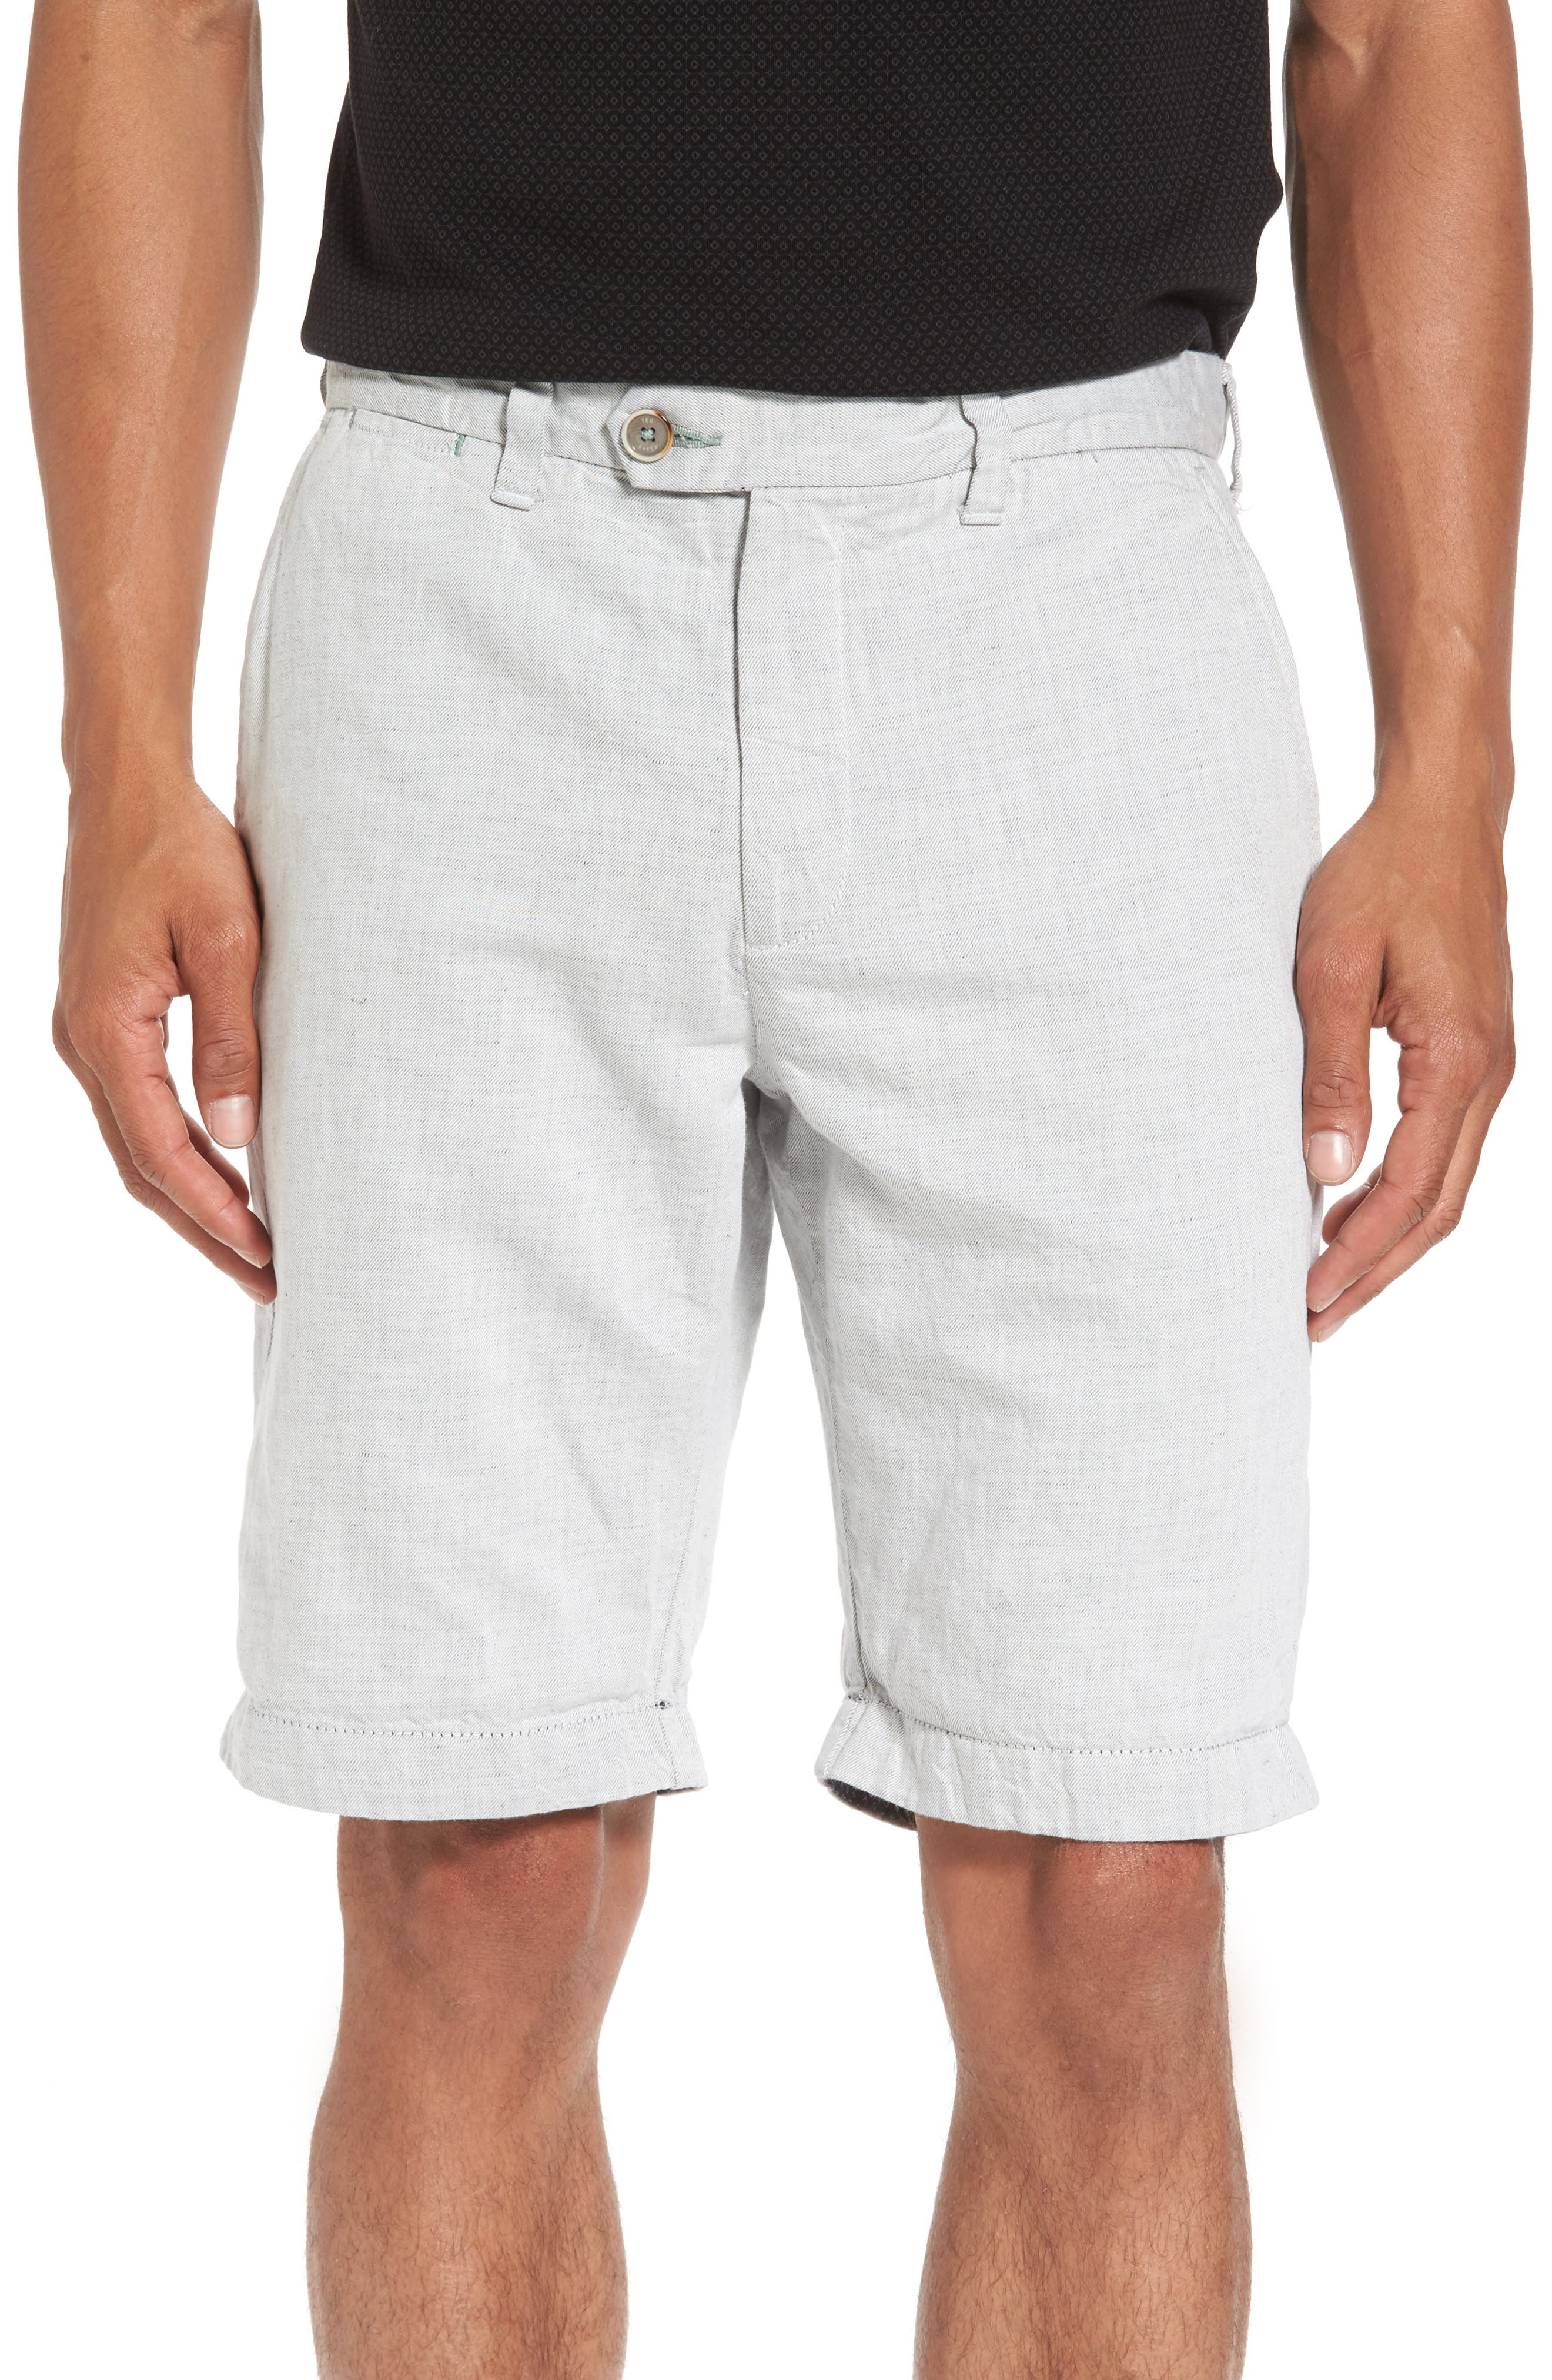 Frisho Cuff Denim Shorts,                         Main,                         color,